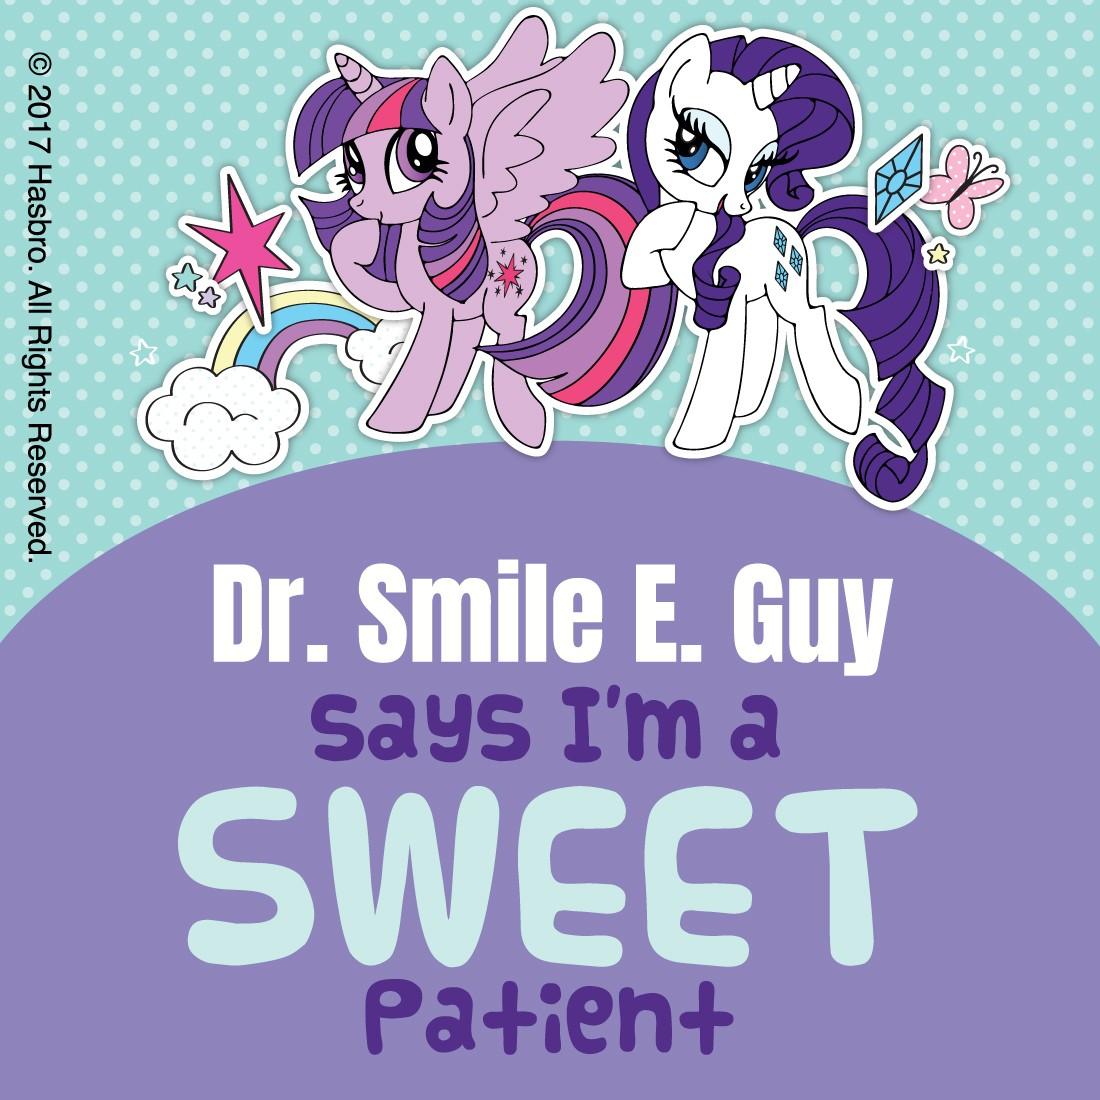 Custom My Little Pony Stickers  [image]